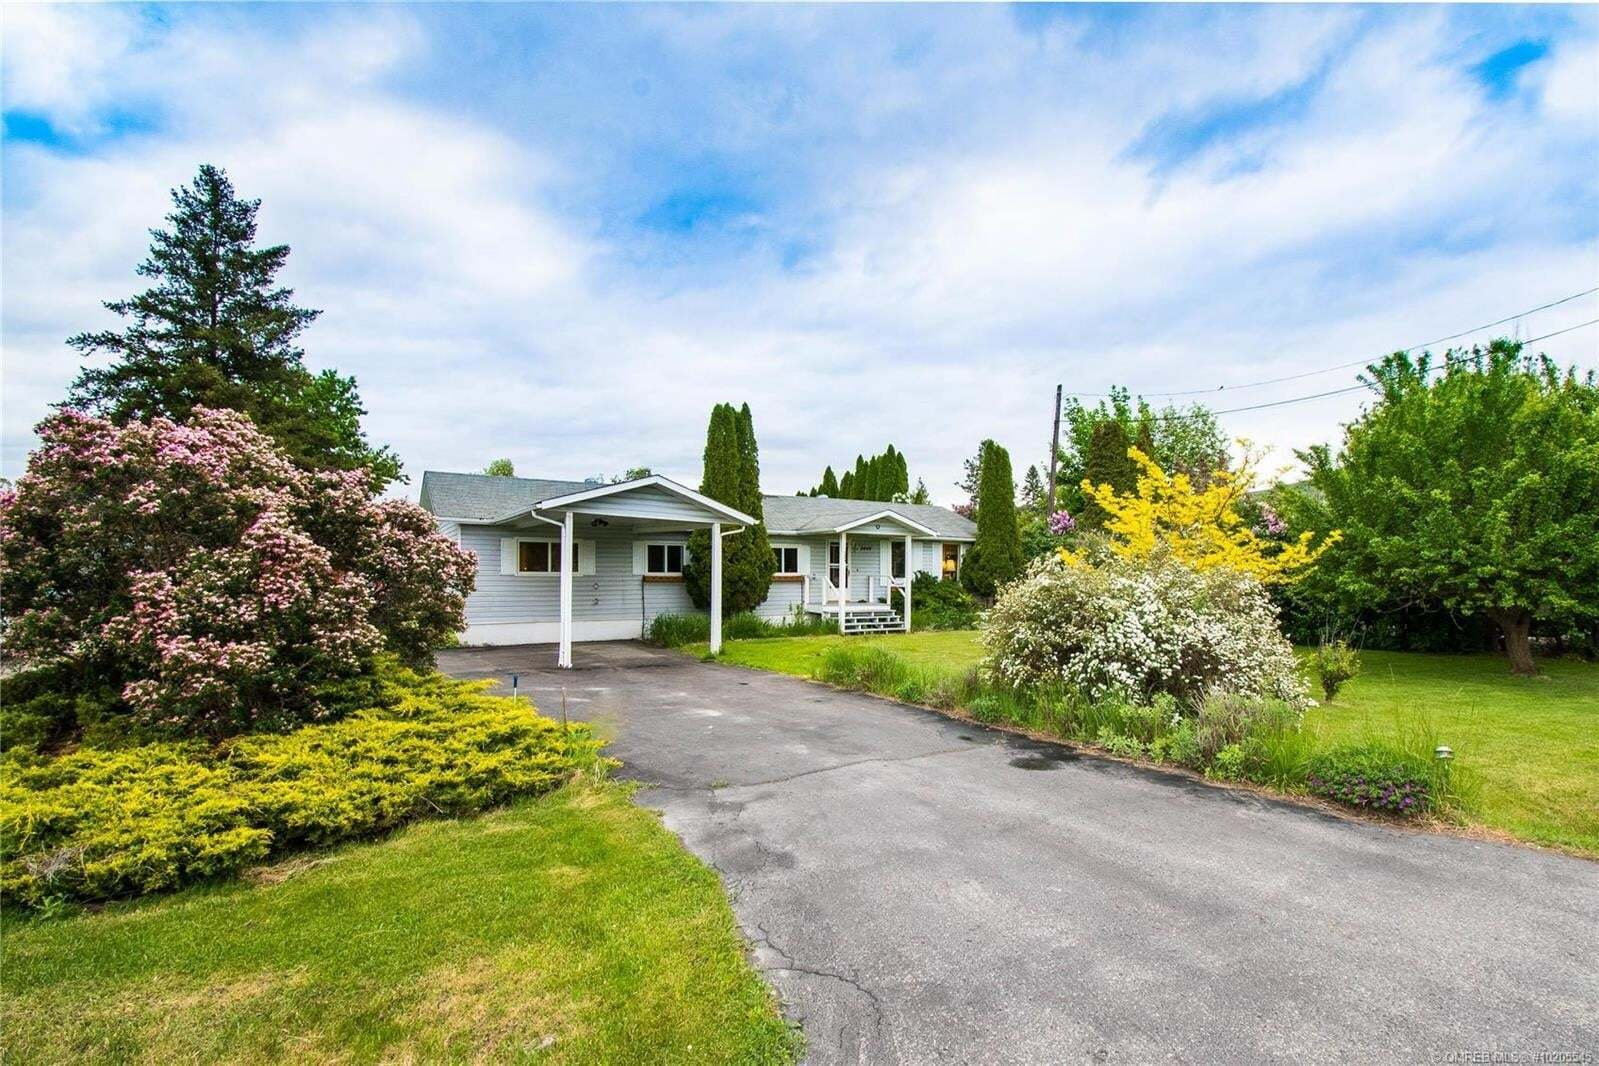 House for sale at 2449 Dallas Rd Vernon British Columbia - MLS: 10205545